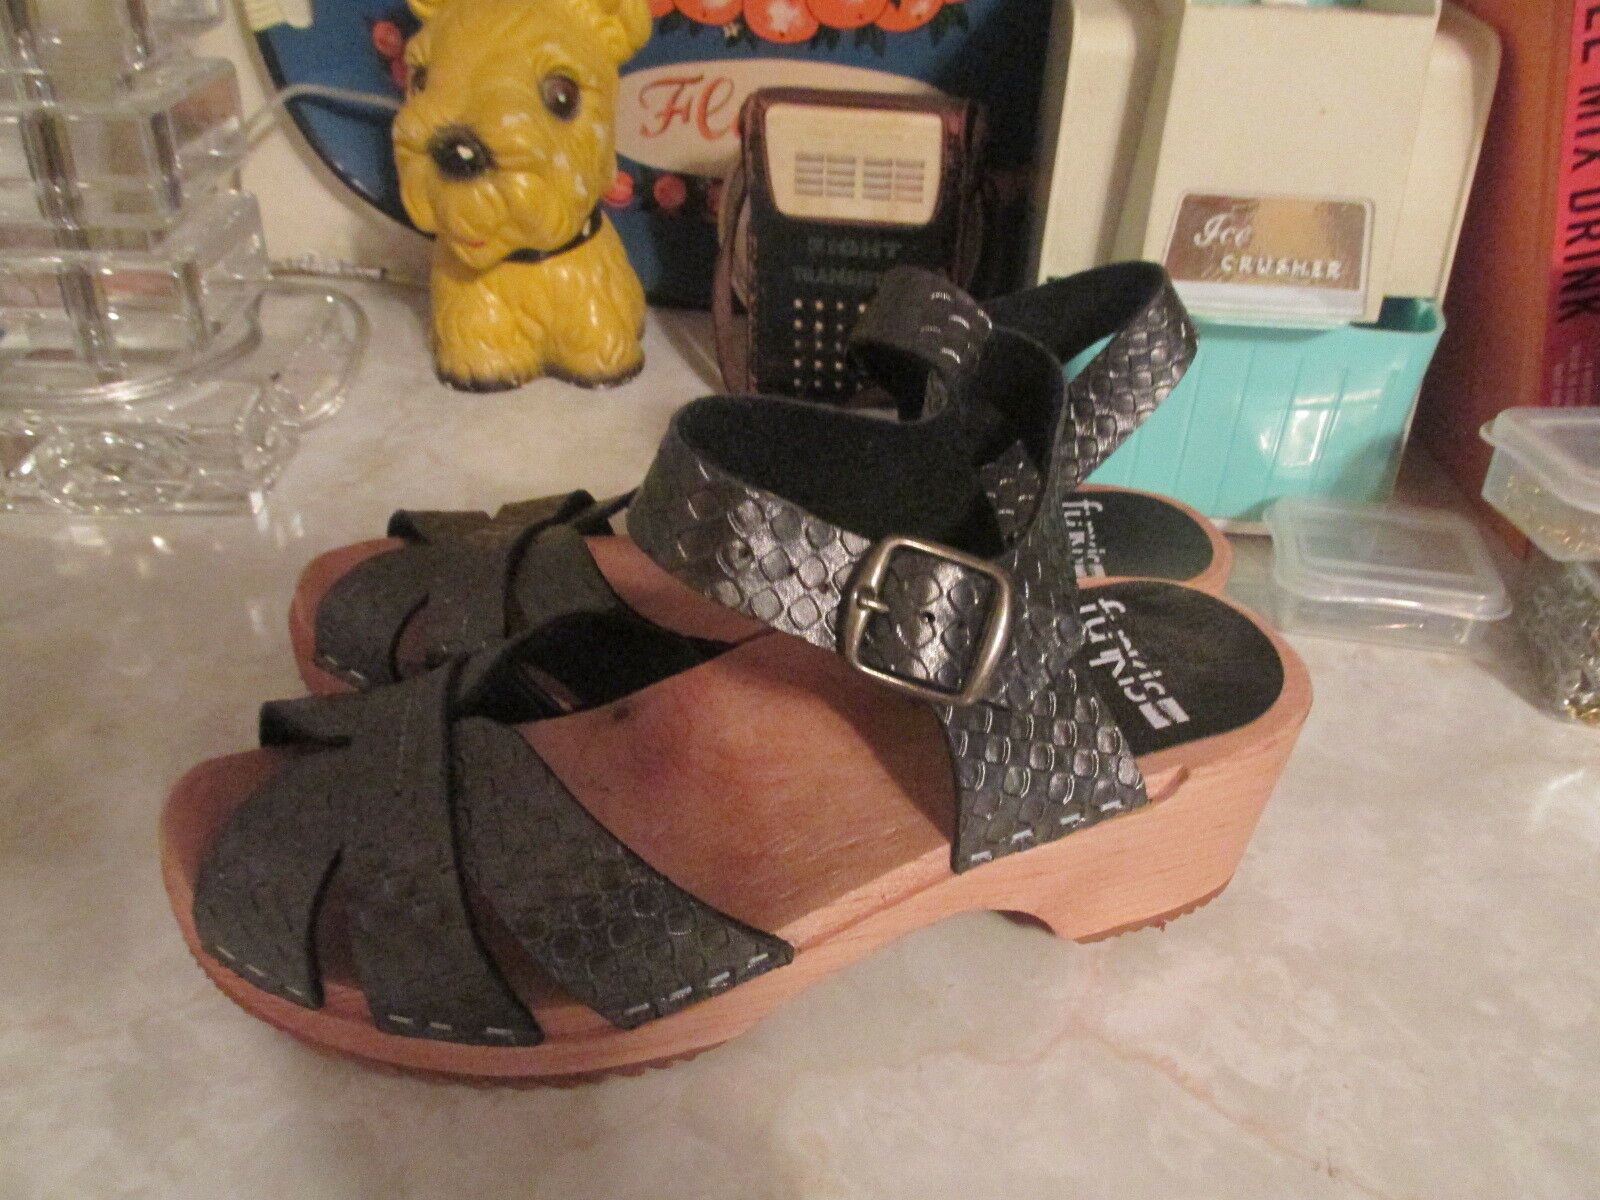 Funkis  peep toe weave clogs size 36 NWOB